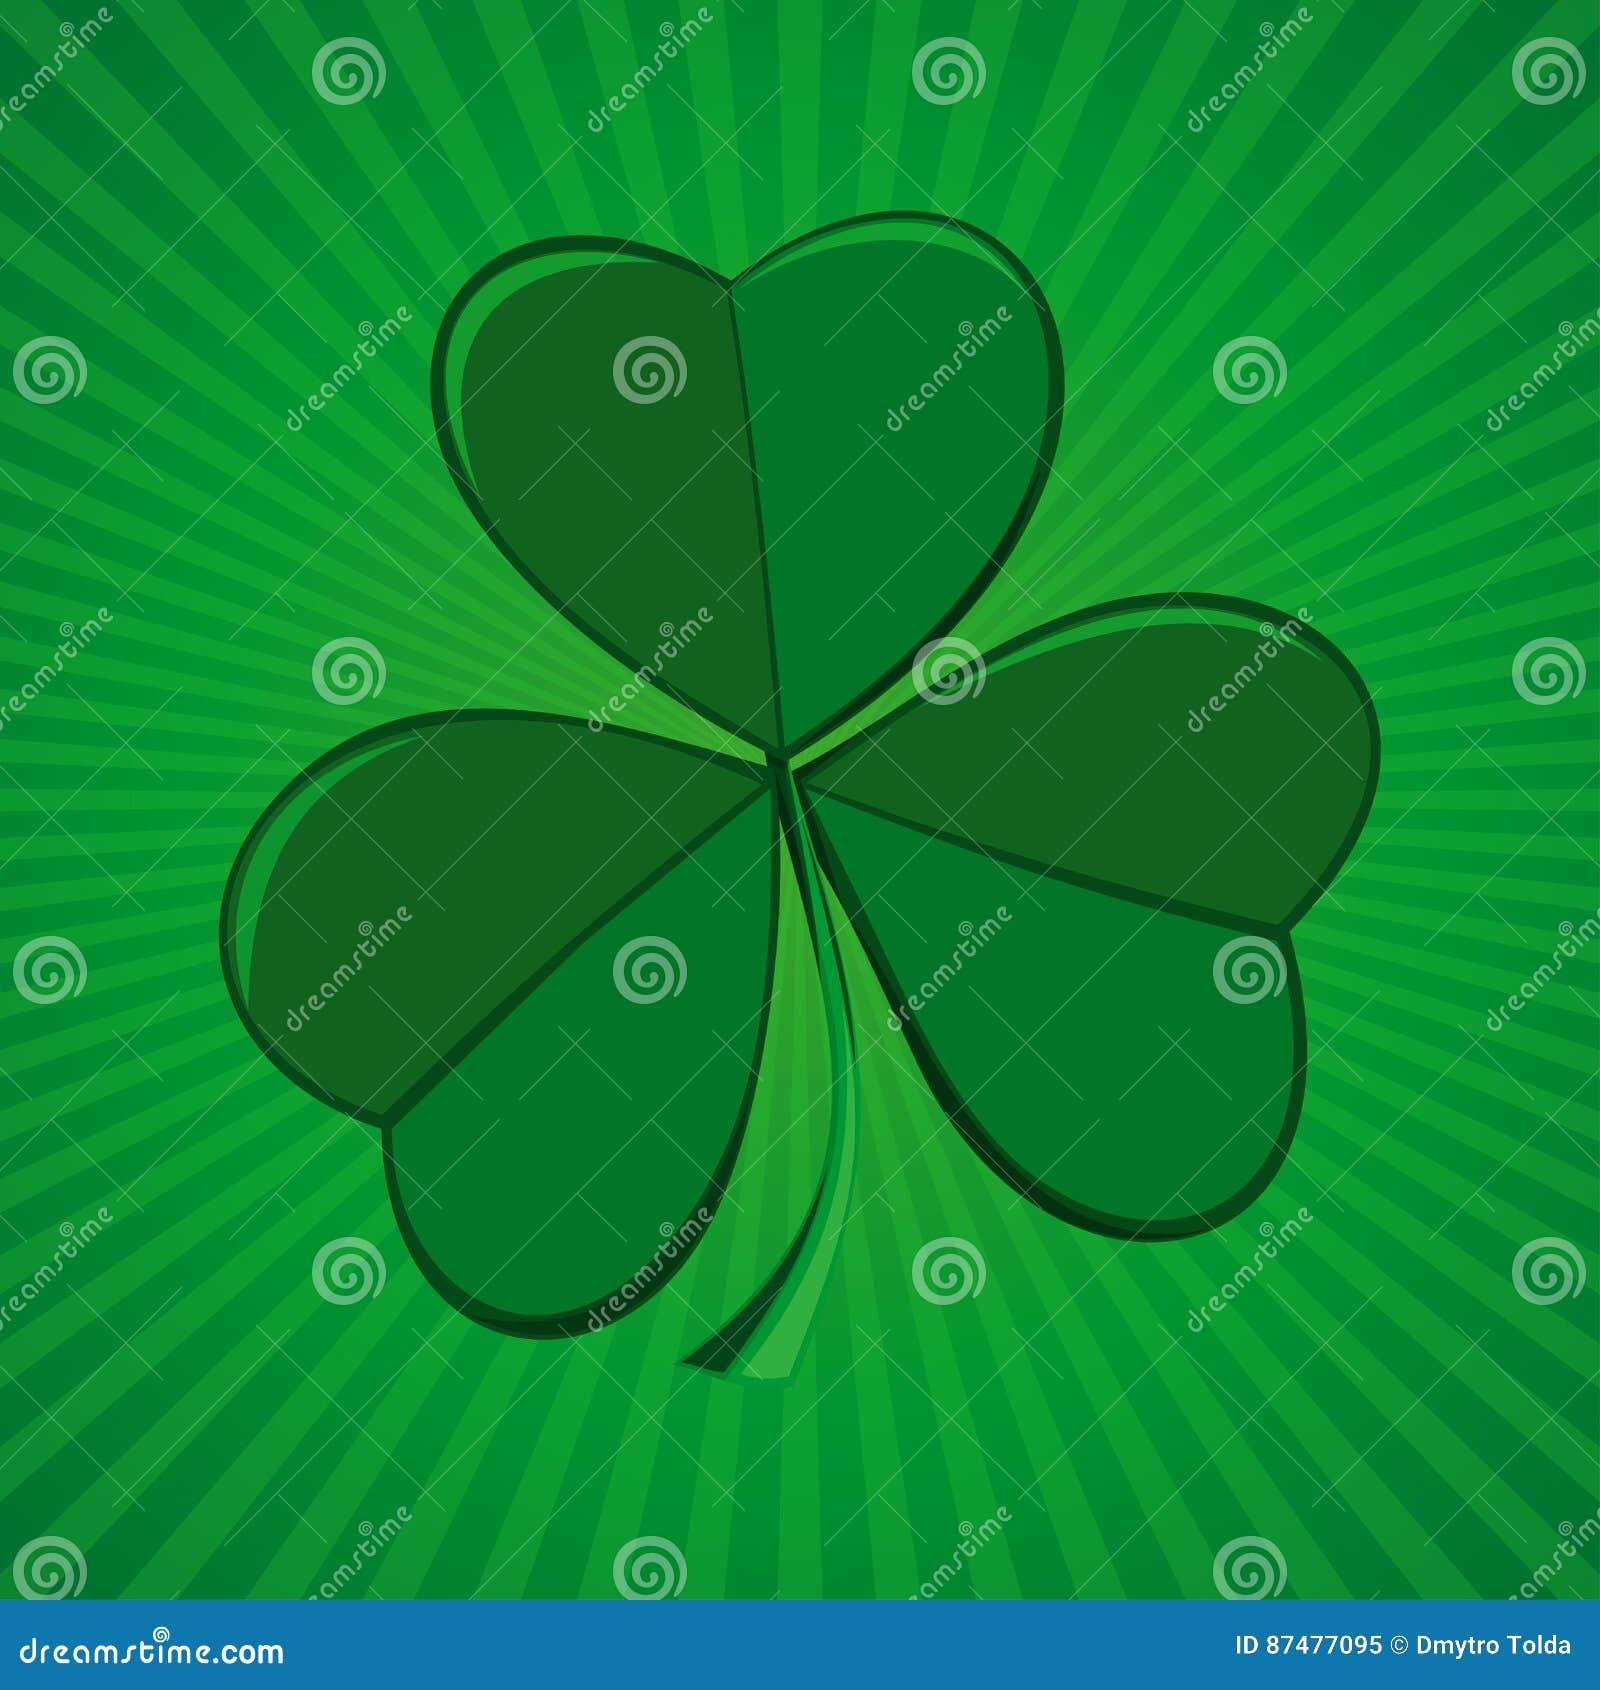 Клевер на зеленой ретро предпосылке Shamrock, trifoliate клевер - символ Ирландии